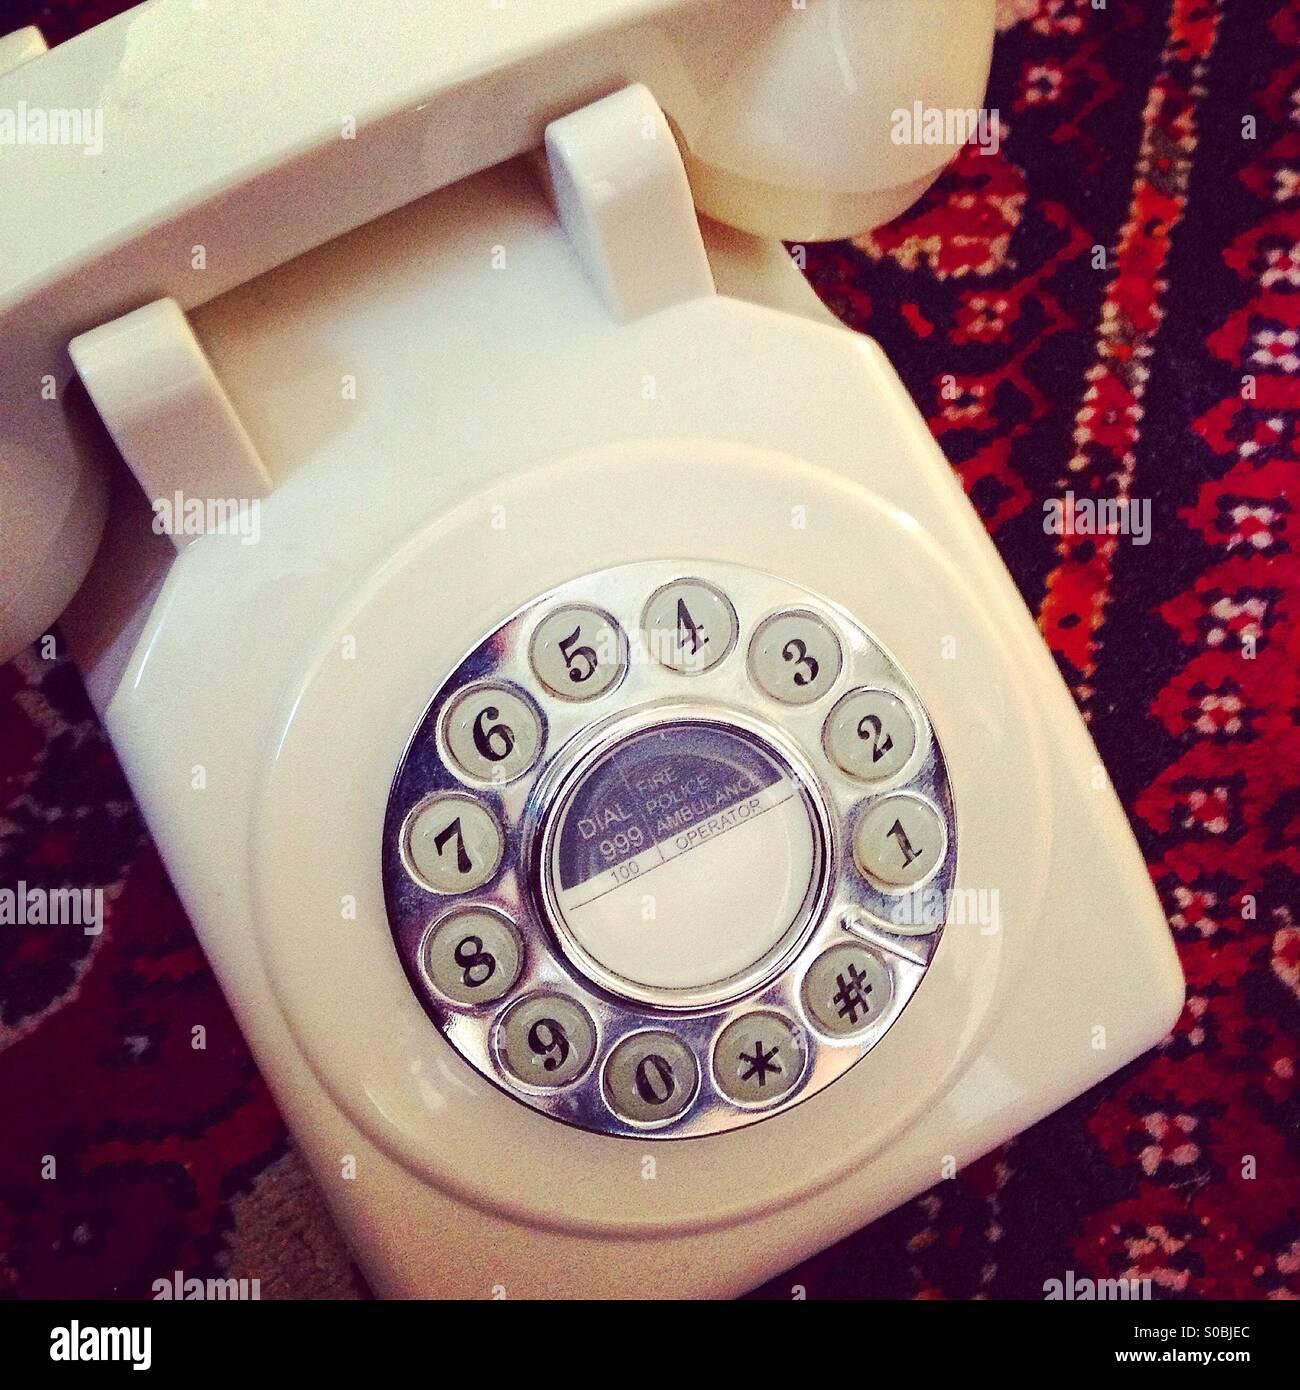 Teléfono Vintage Style Imagen De Stock